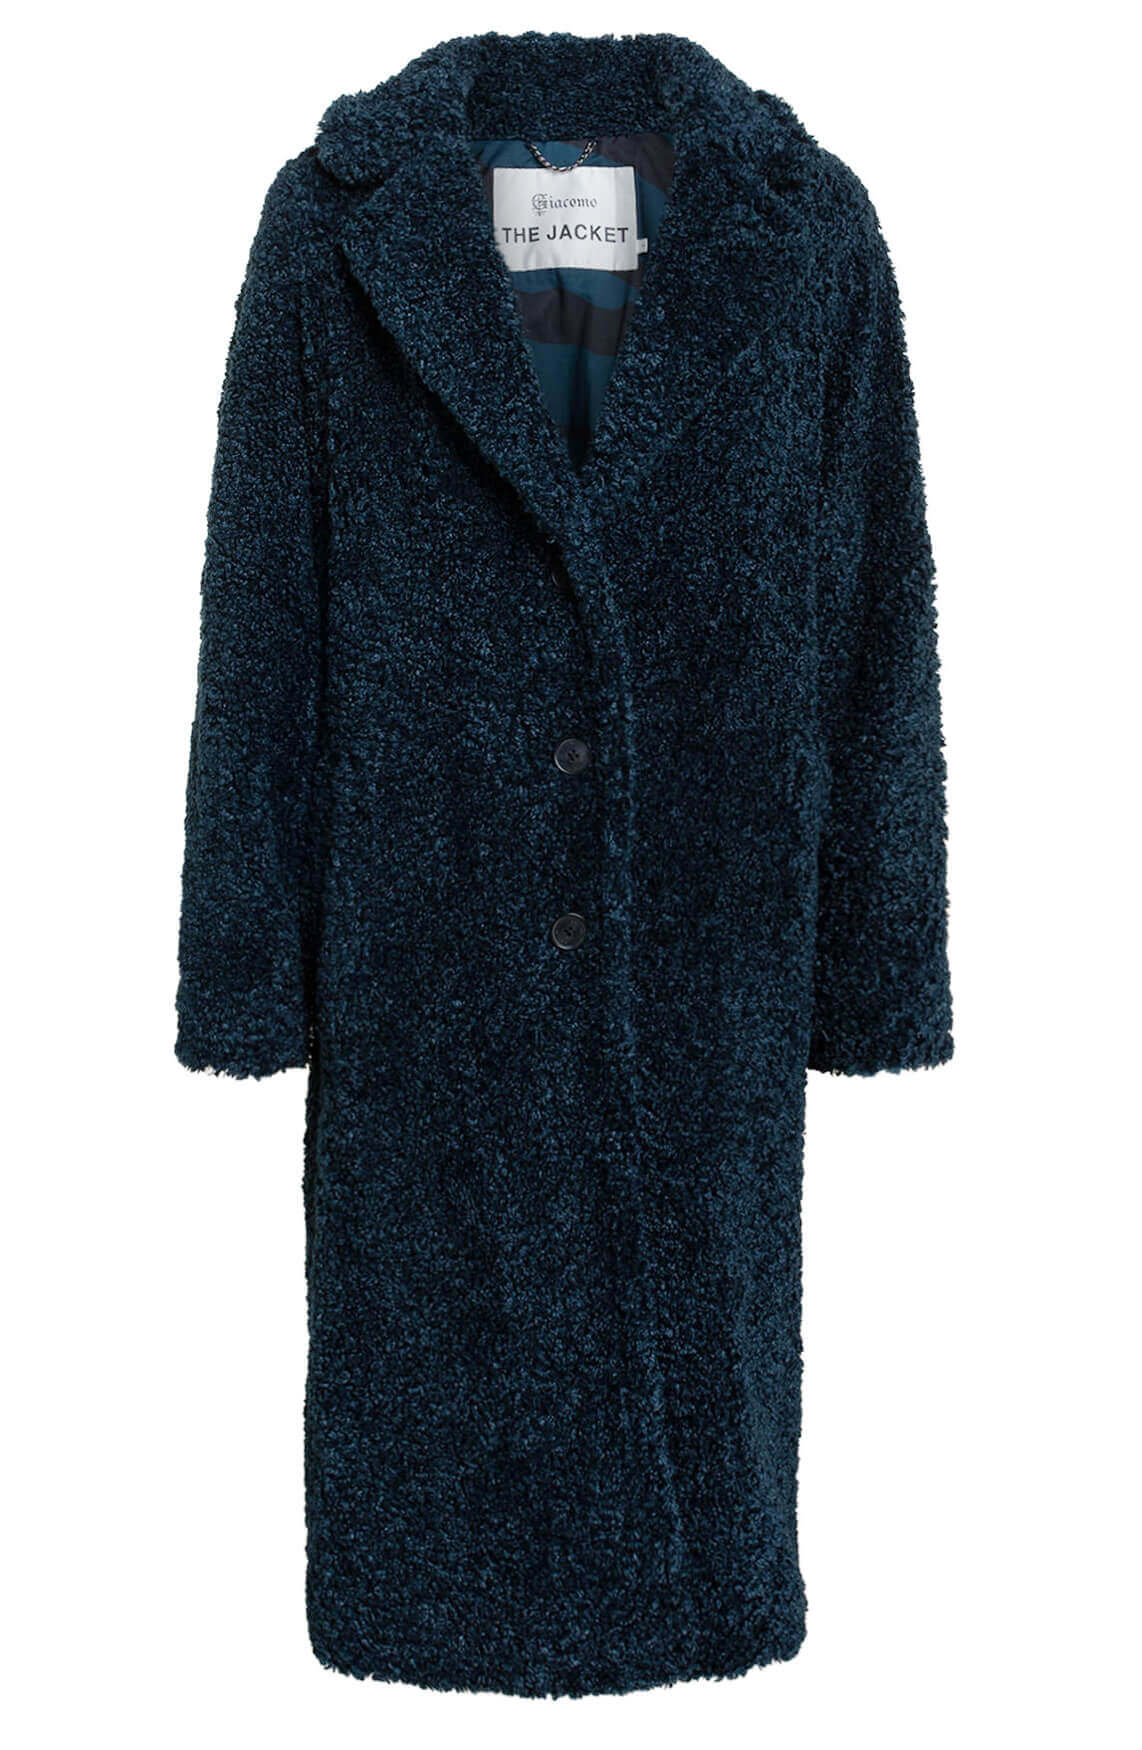 Giacomo Dames Lange teddy mantel Blauw